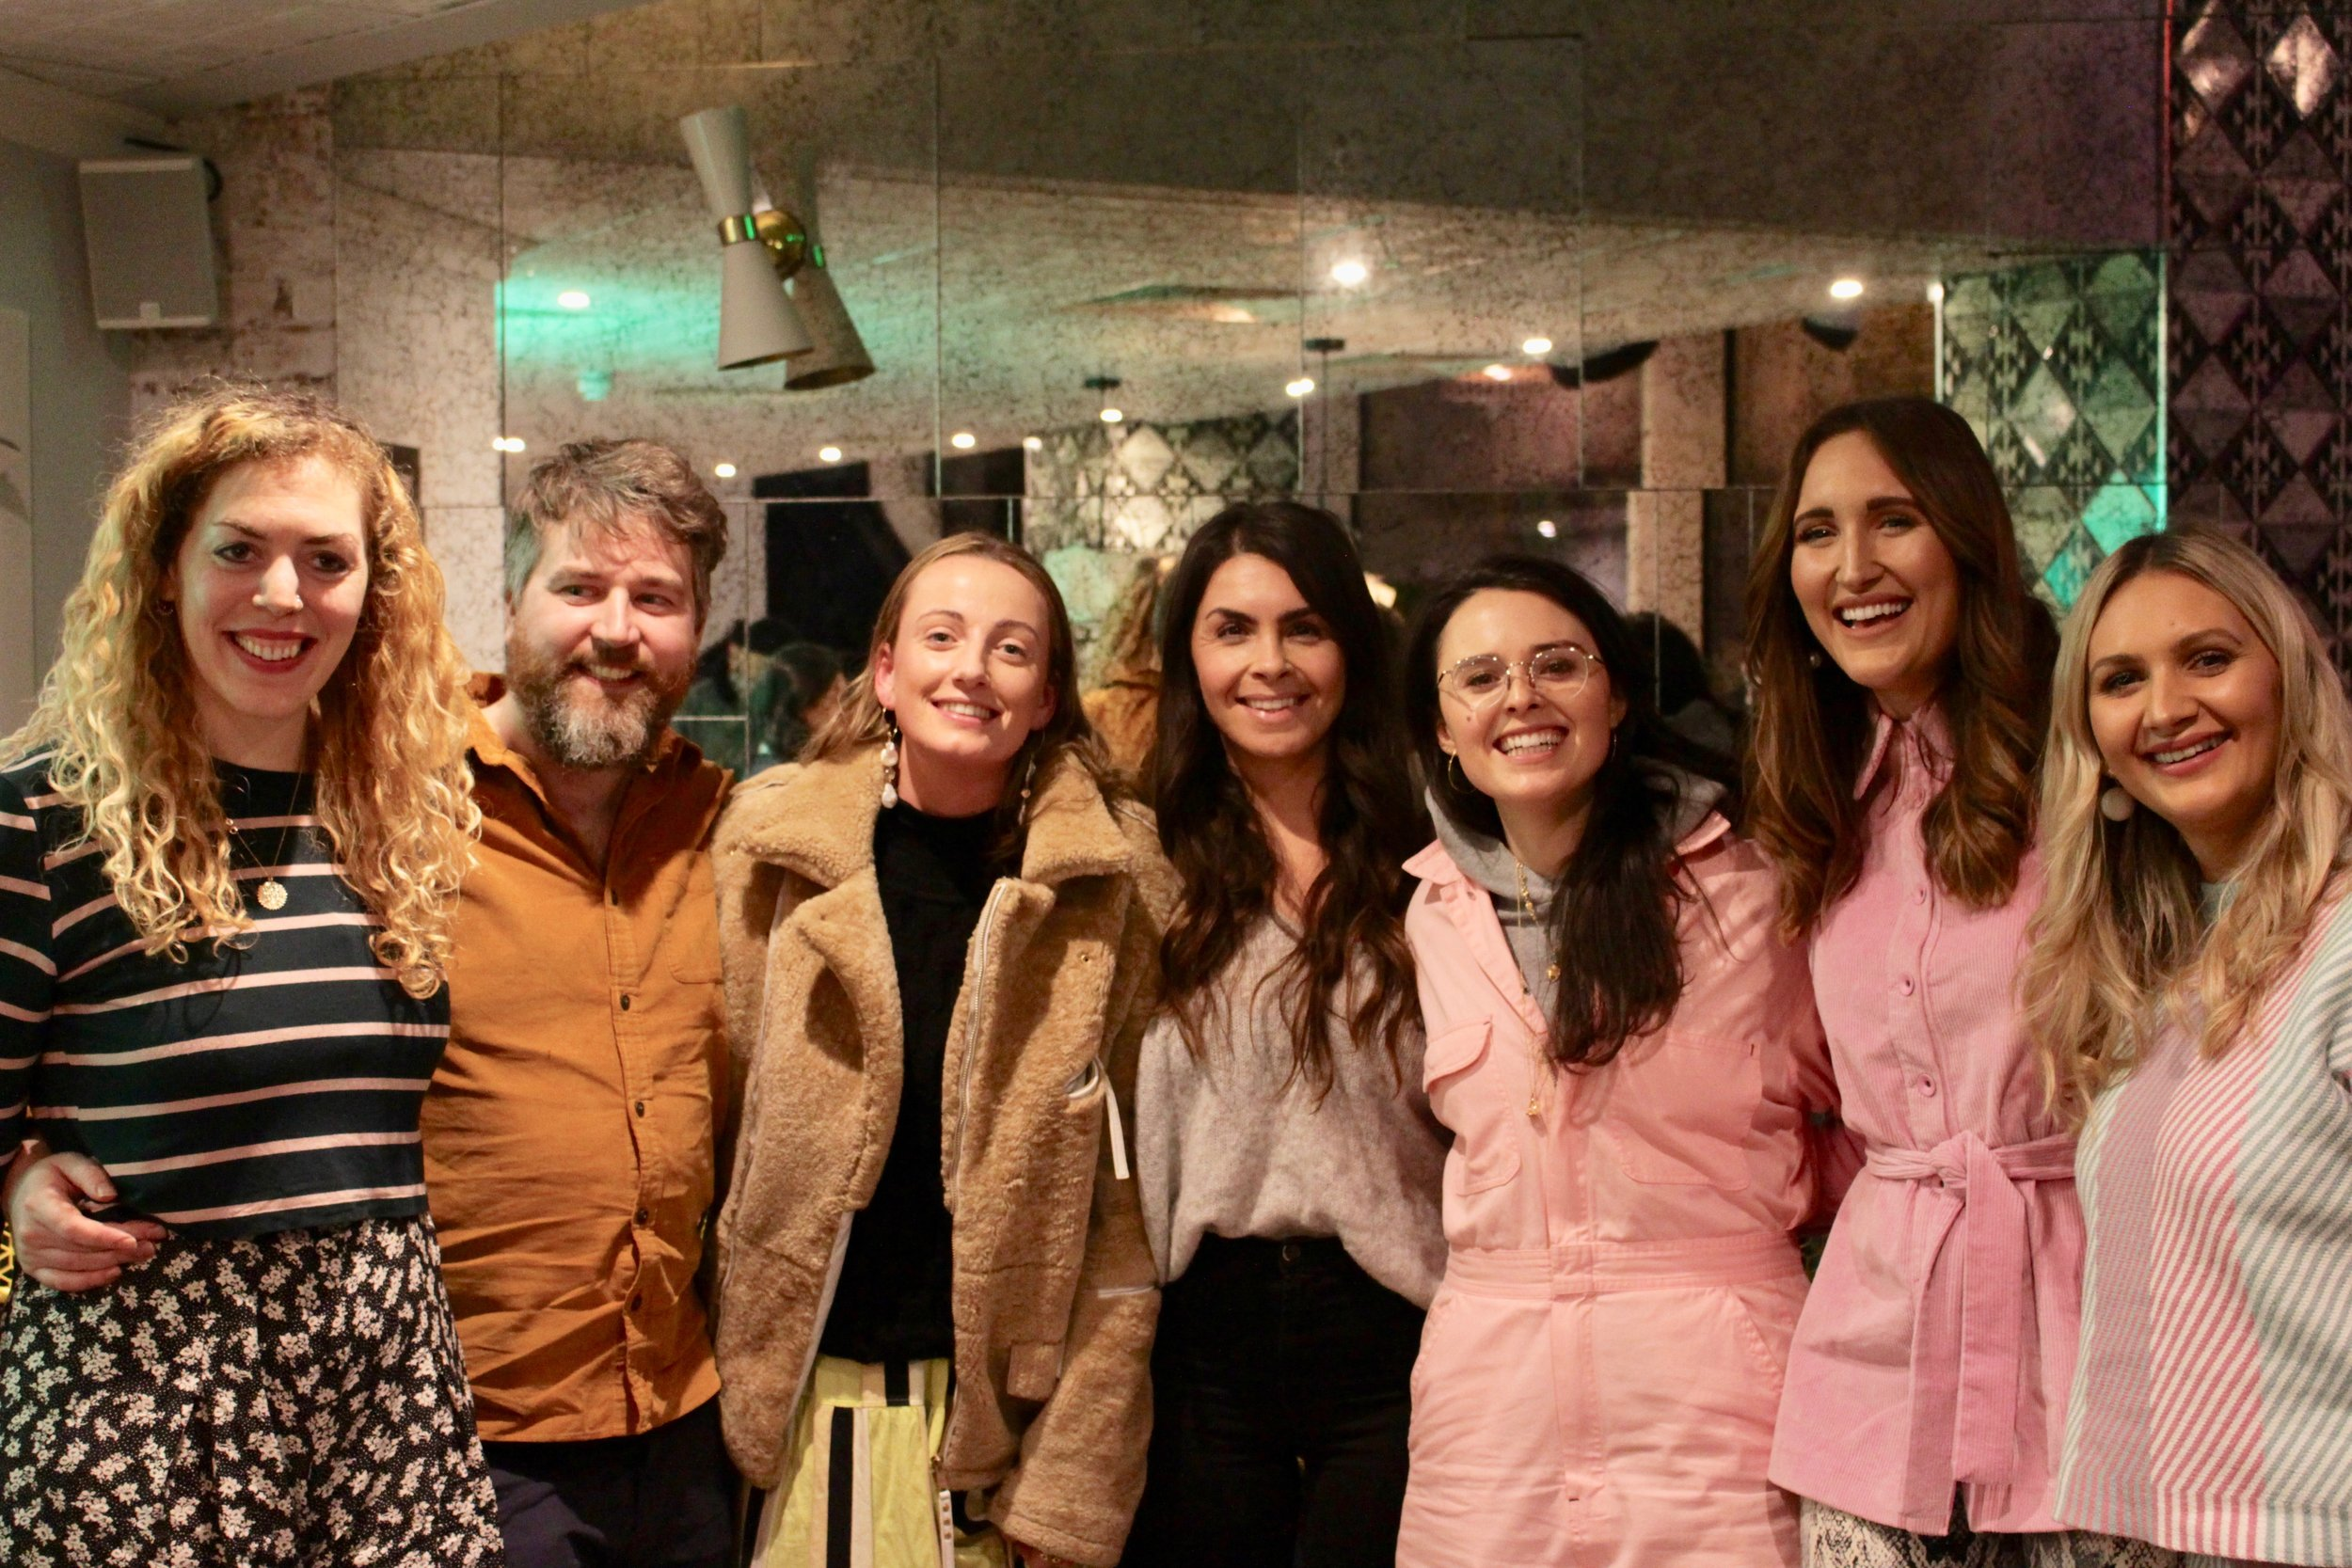 Vevolution co-founders, Judy & Damien, Jemma Finch, Alessandra Petrucci, Venetia Falconer, & Sophie & Hannah Pycroft